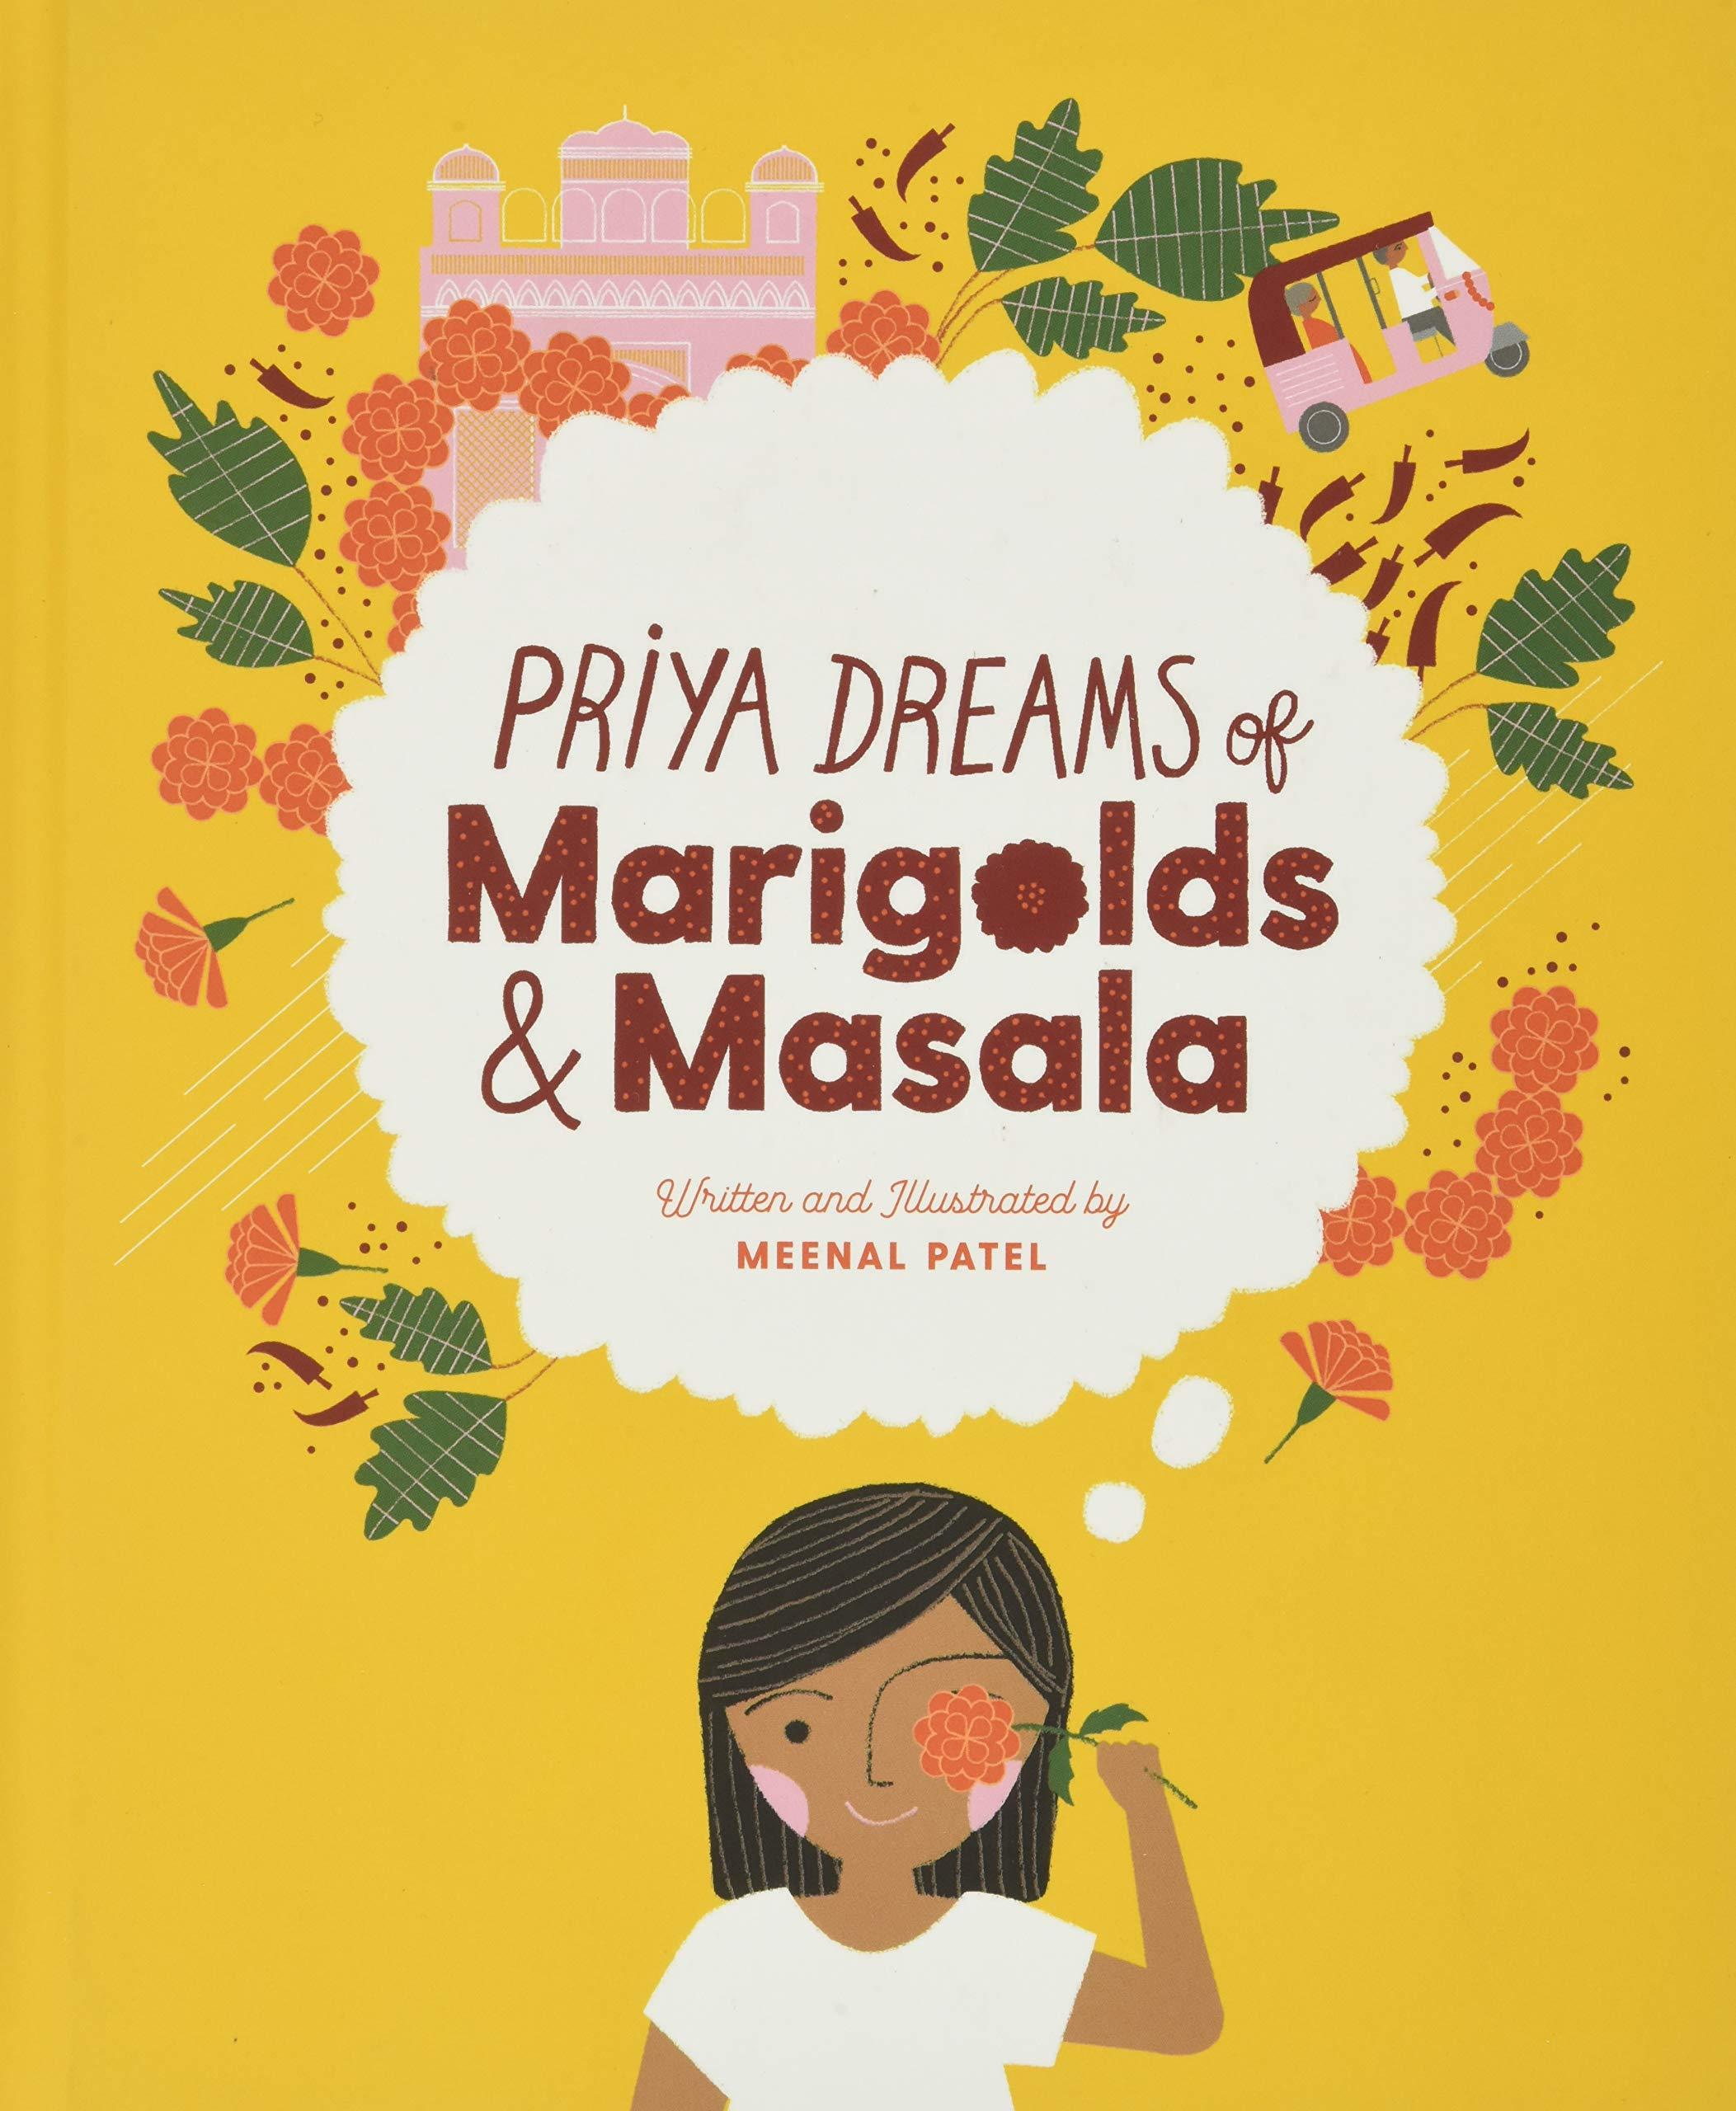 Priya Dreams of Marigolds & Masala: Meenal Patel: 9781643439556: Amazon.com: Books